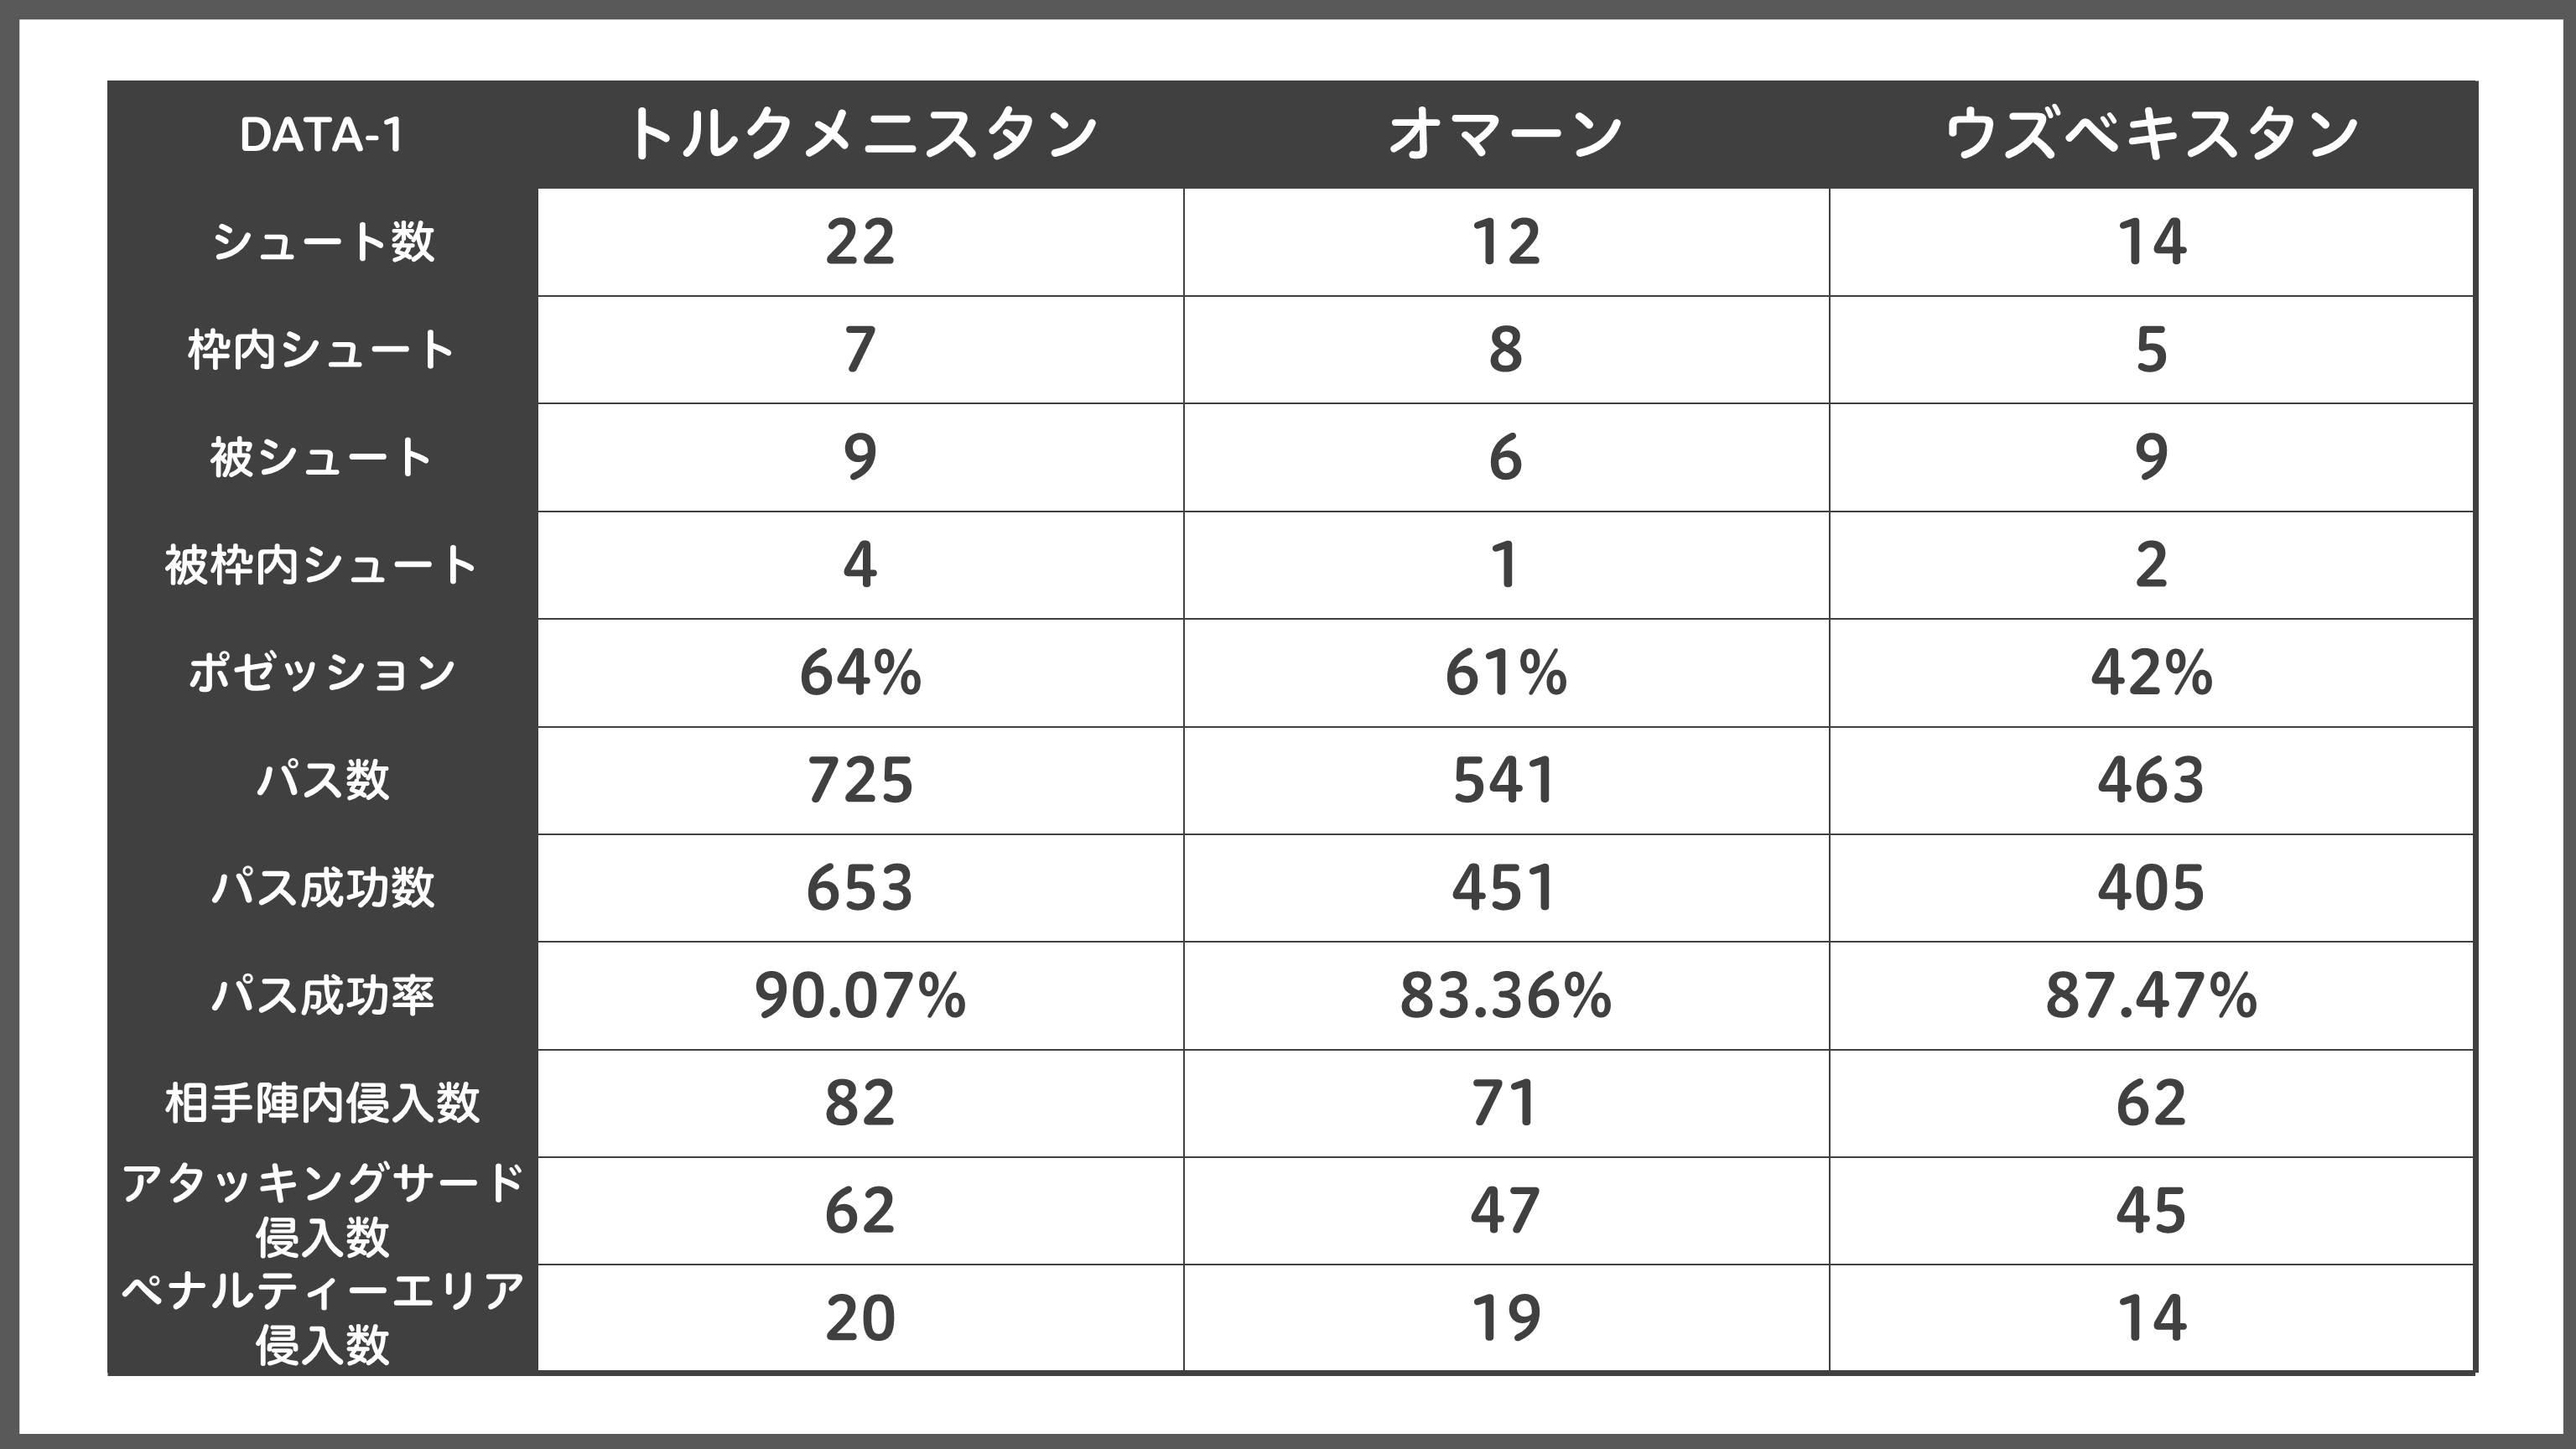 [DATA-1]グループリーグ3試合の日本代表スタッツ【表:Evolving Data】